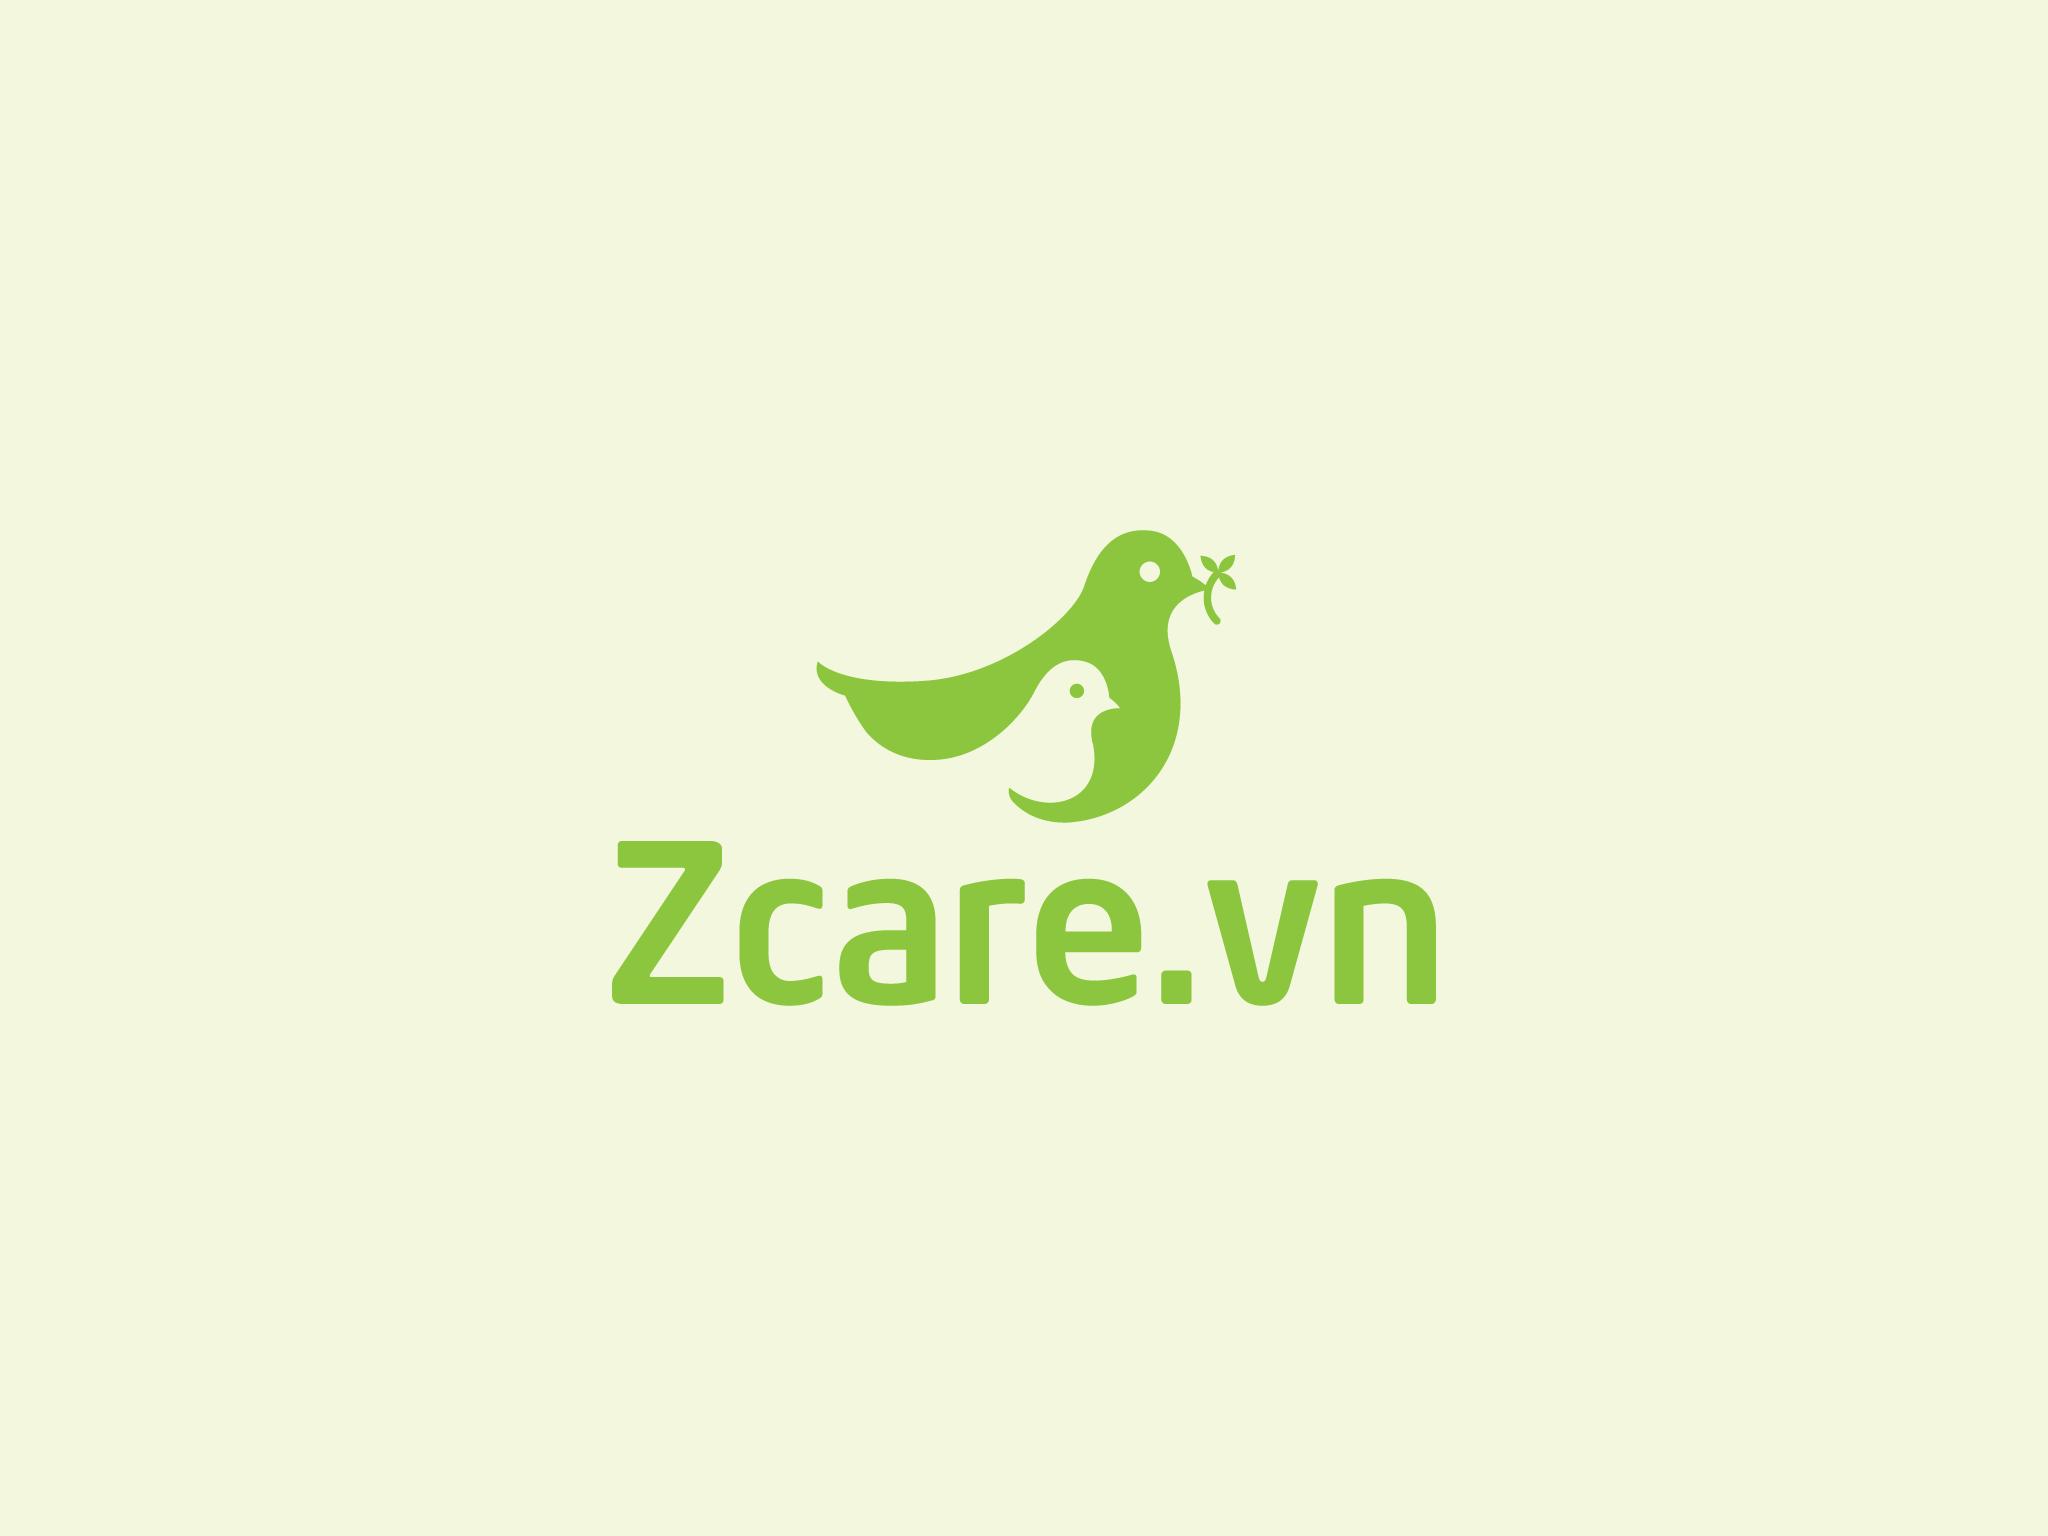 Logo Zcare